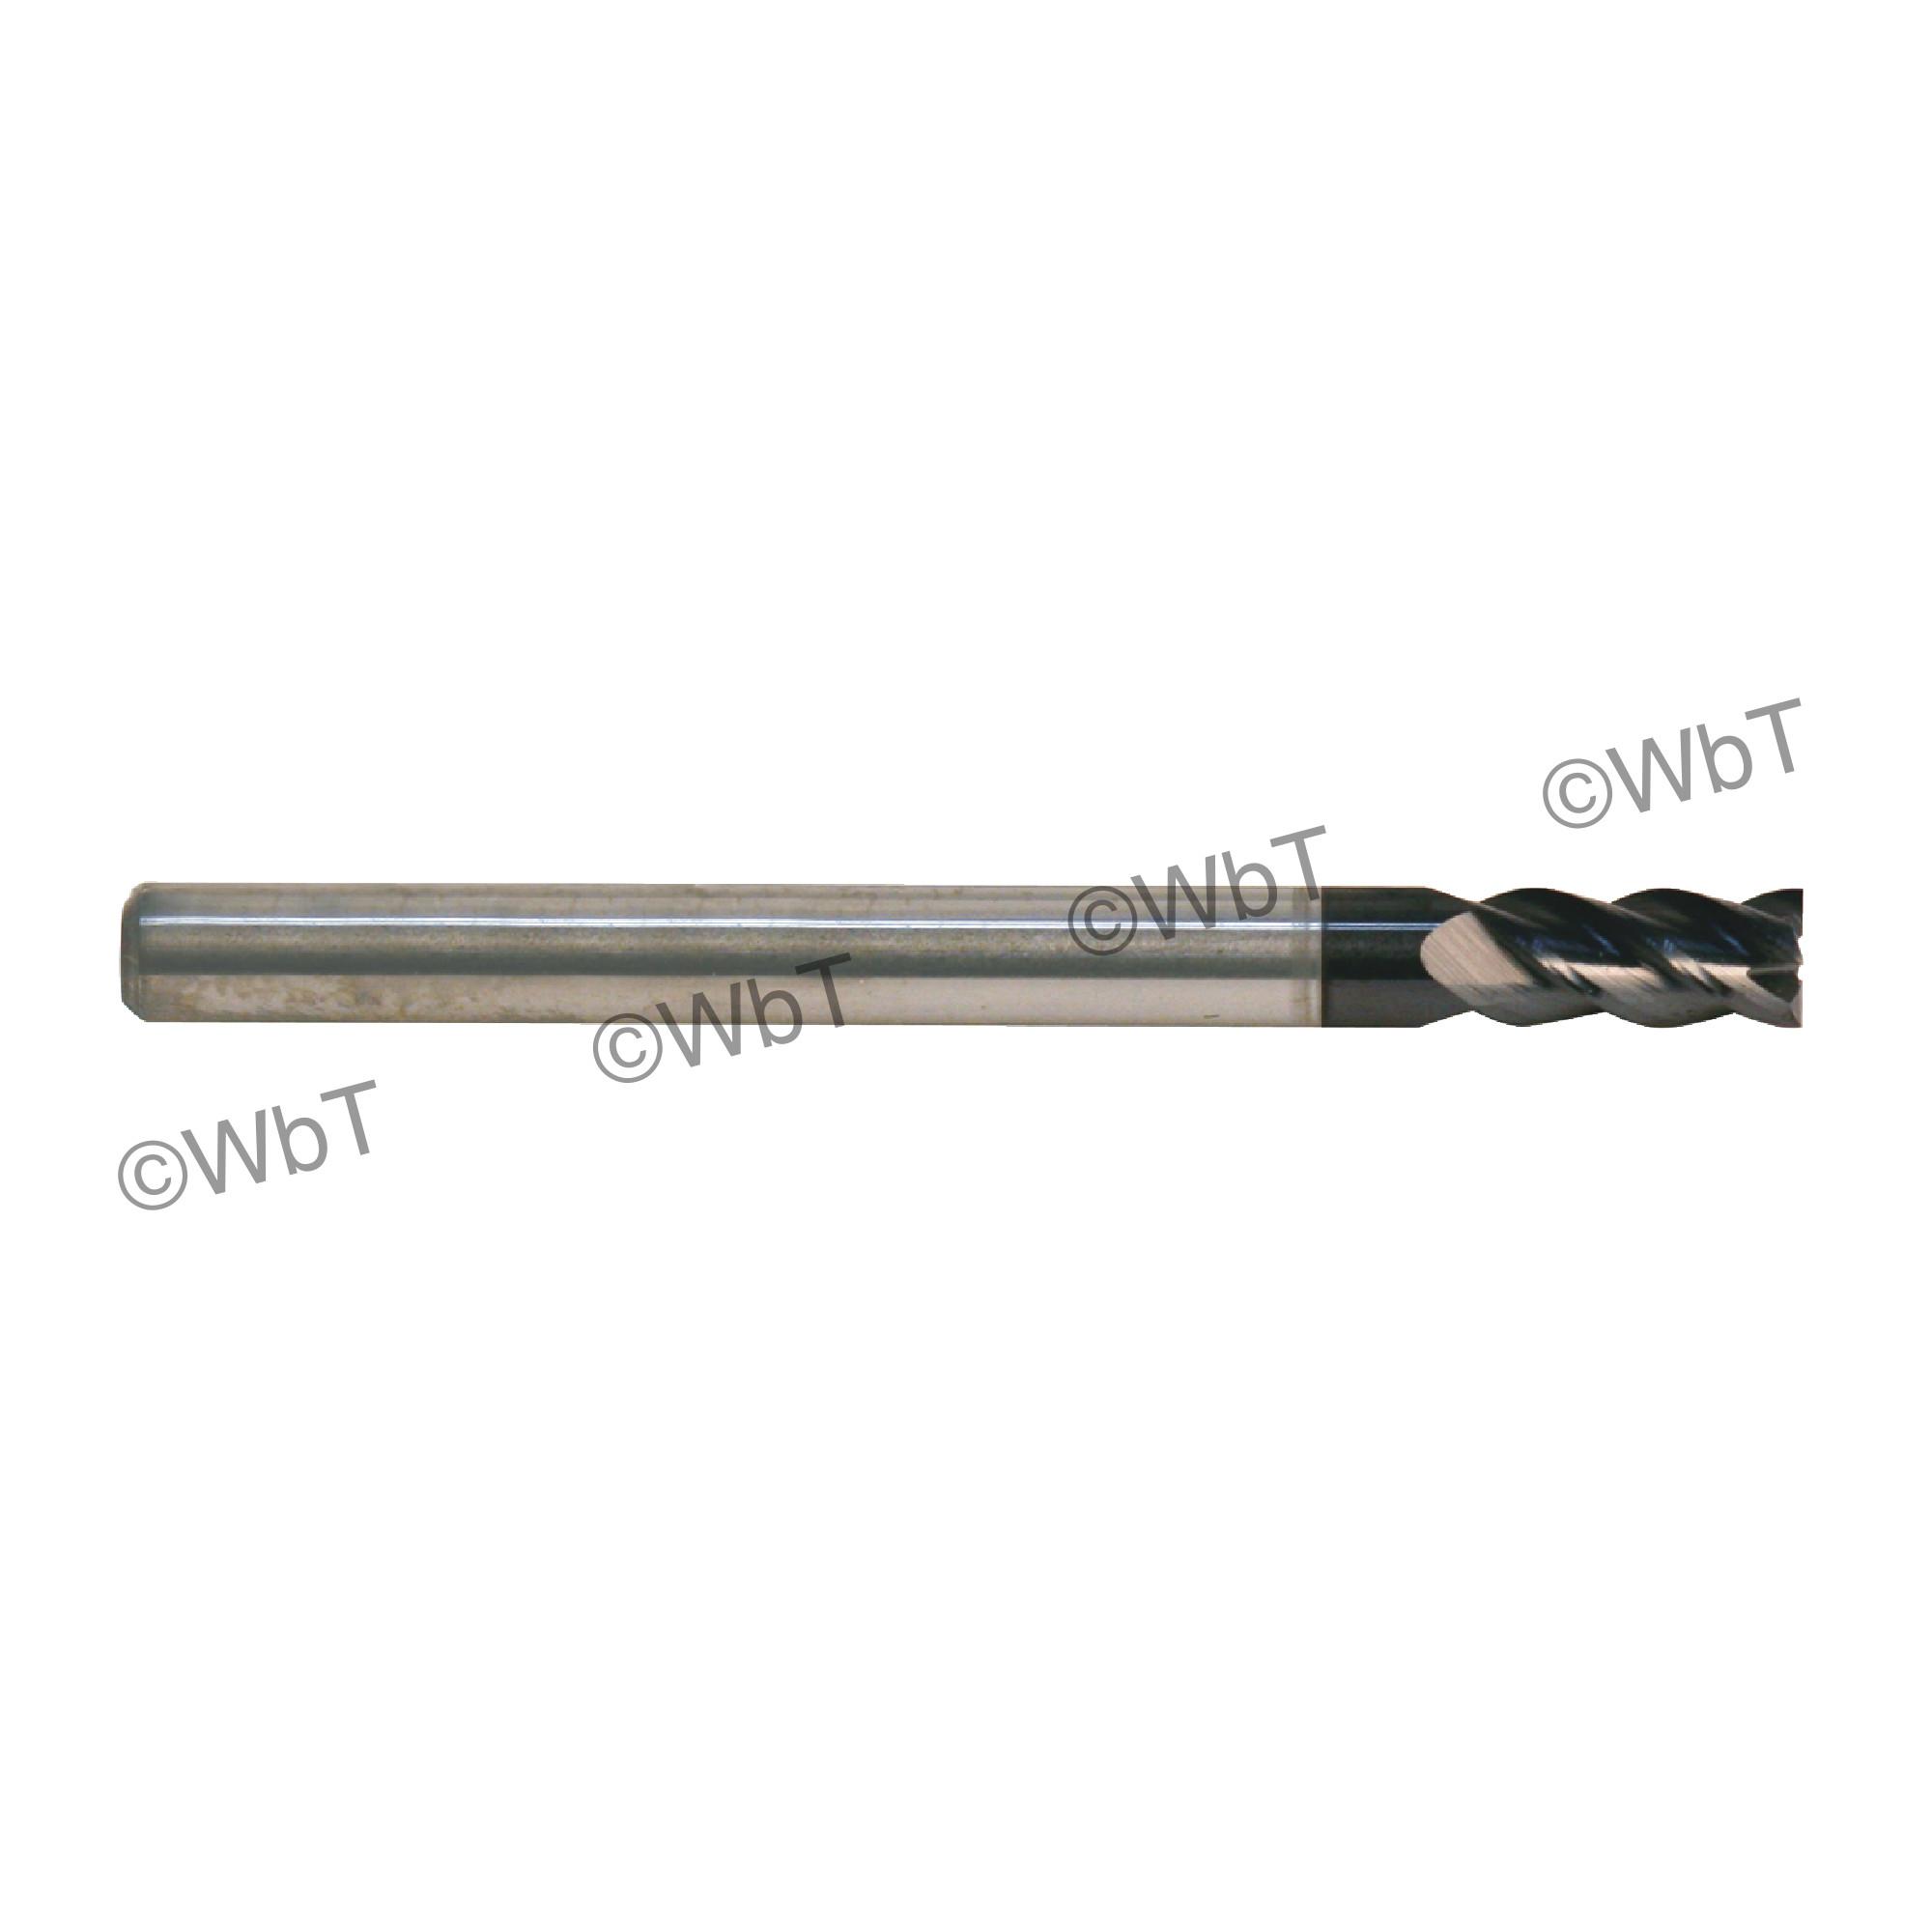 "1/2"" Solid Carbide 10% Cobalt 40° 4 Flute Center Cutting Stub Length Single End Mill"